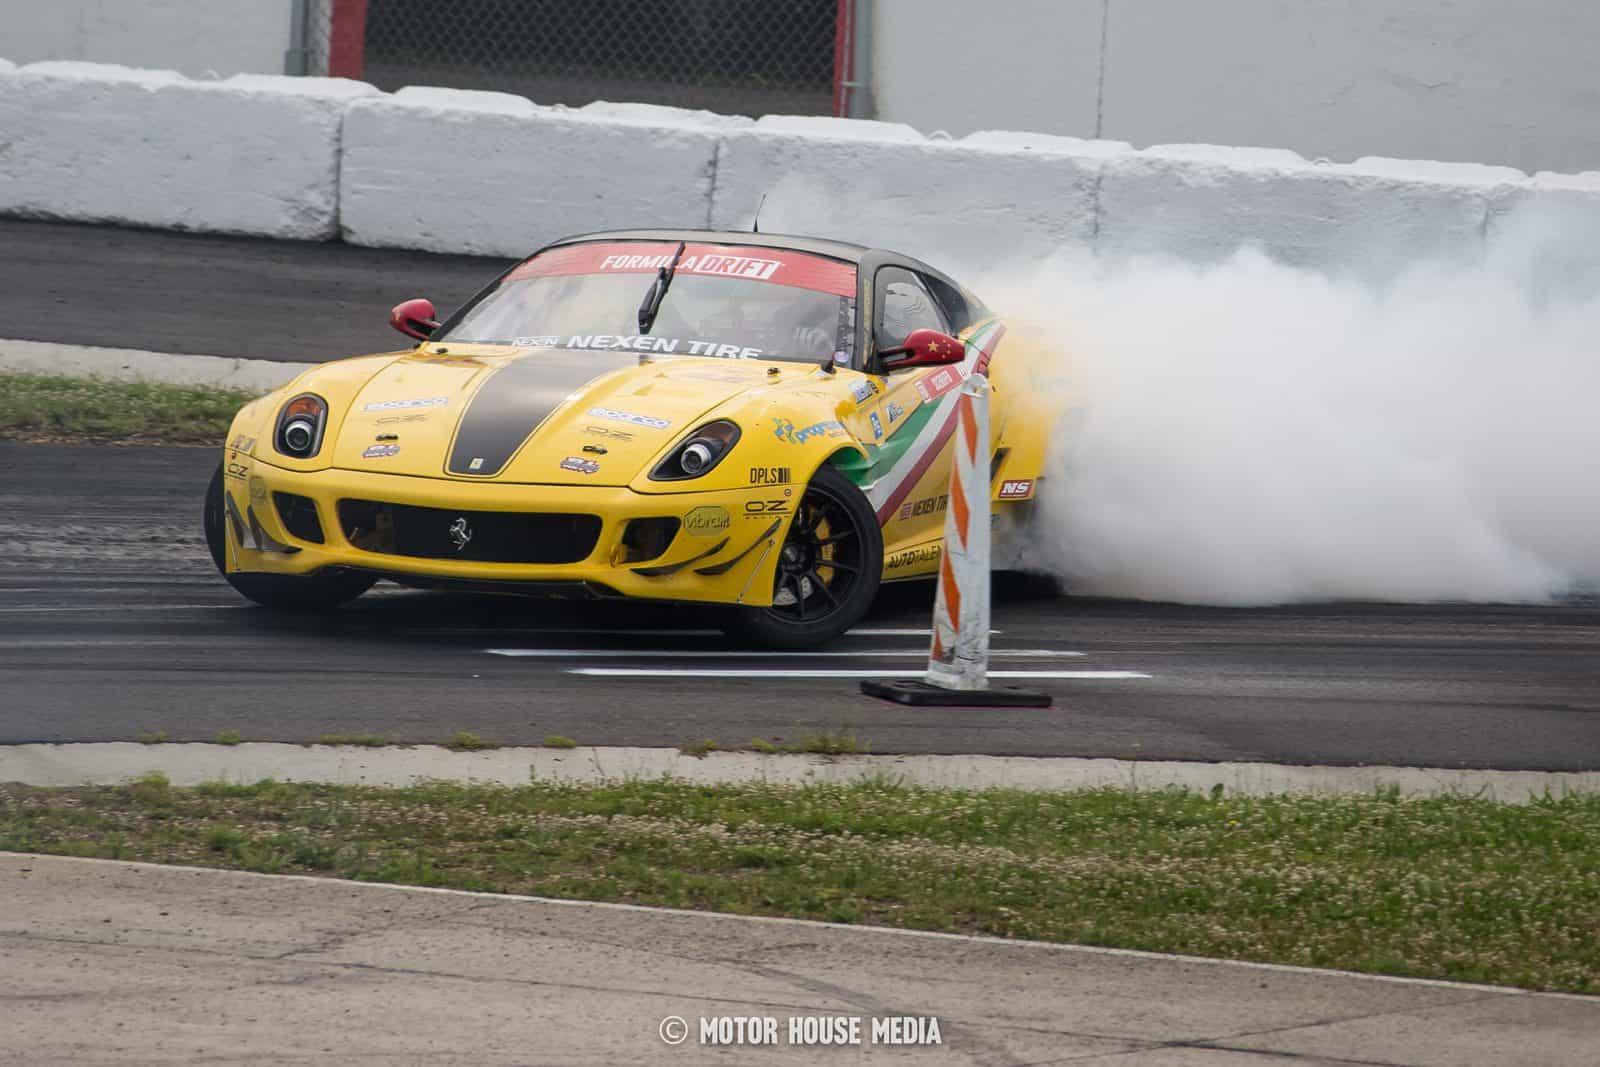 Federico Sceriffo in his Ferrari drift car